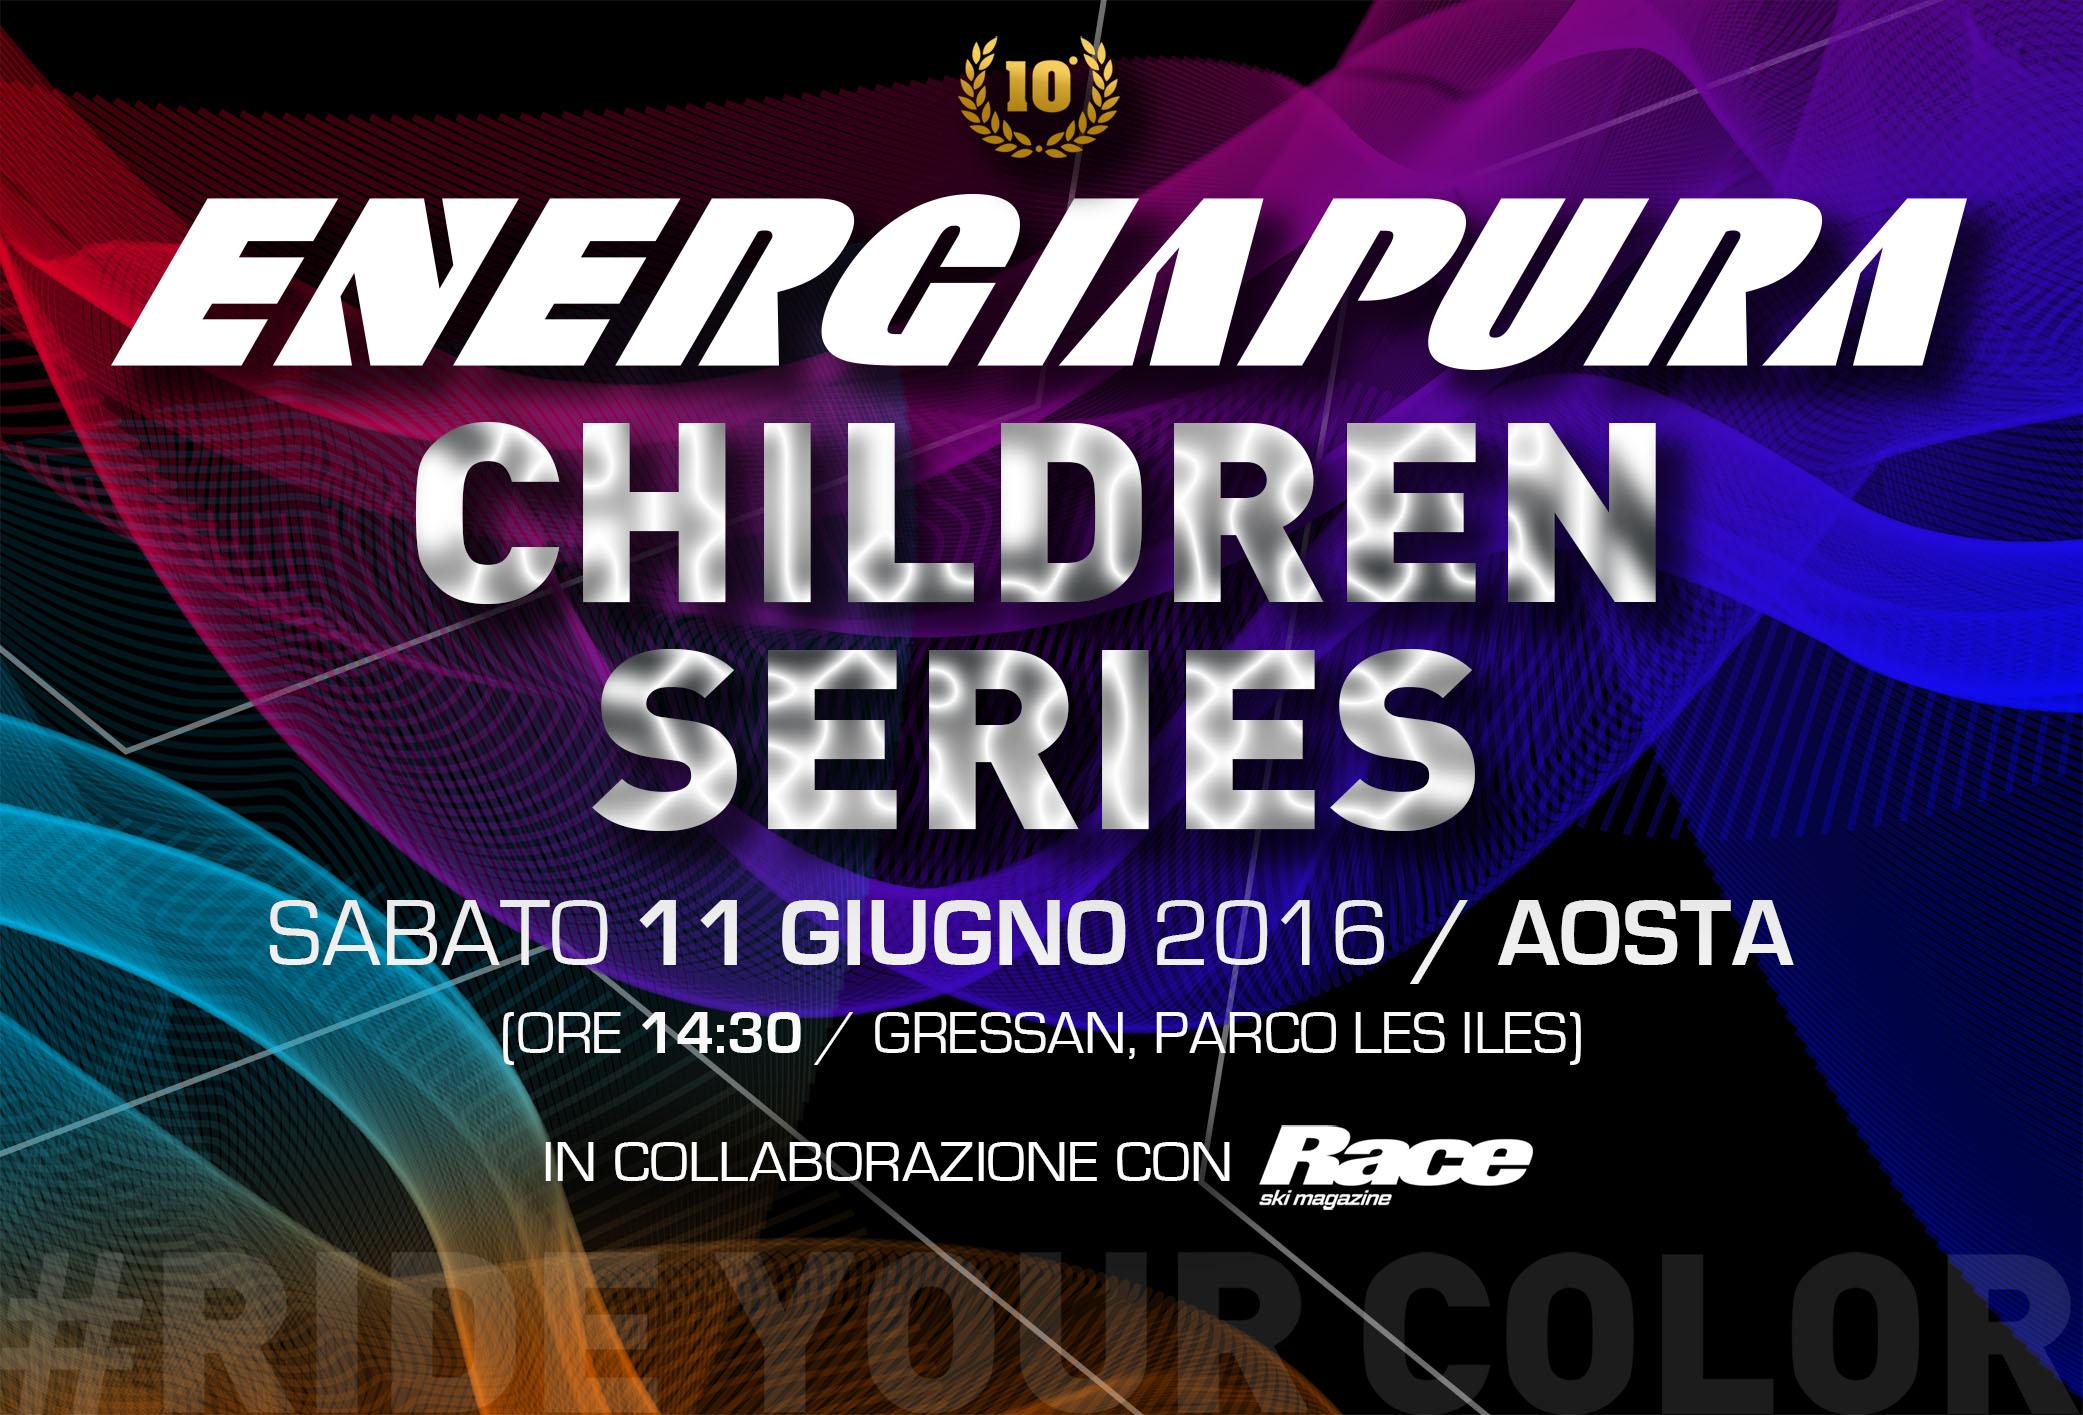 INVITO ENERGIAPURA CHILDREN SERIES 2016